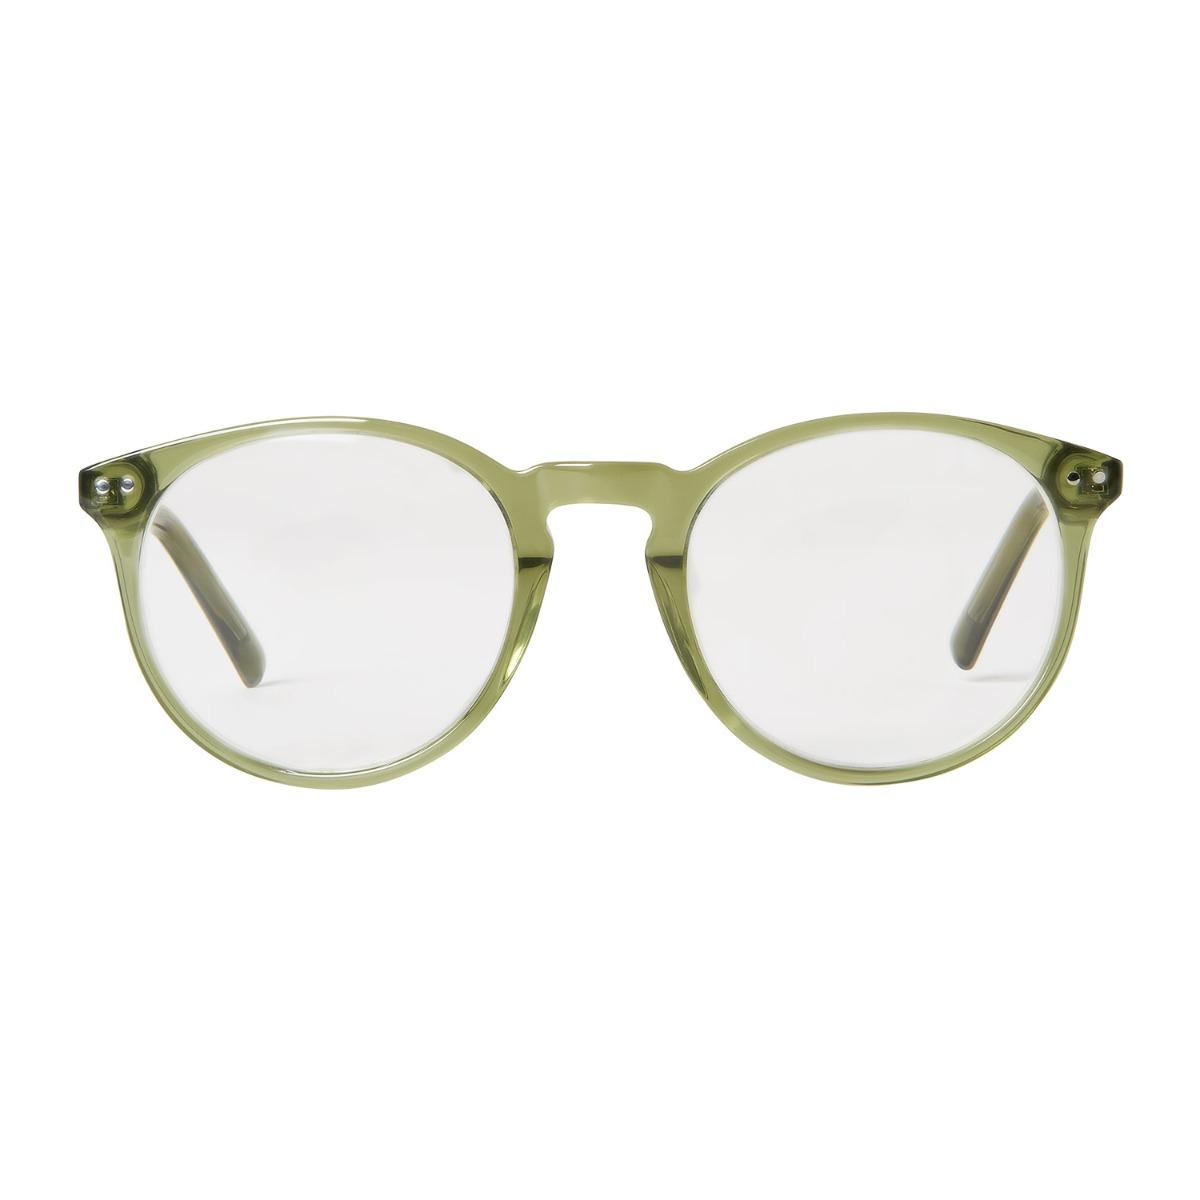 Designtorget Läsglasögon DT Rund Grön +2